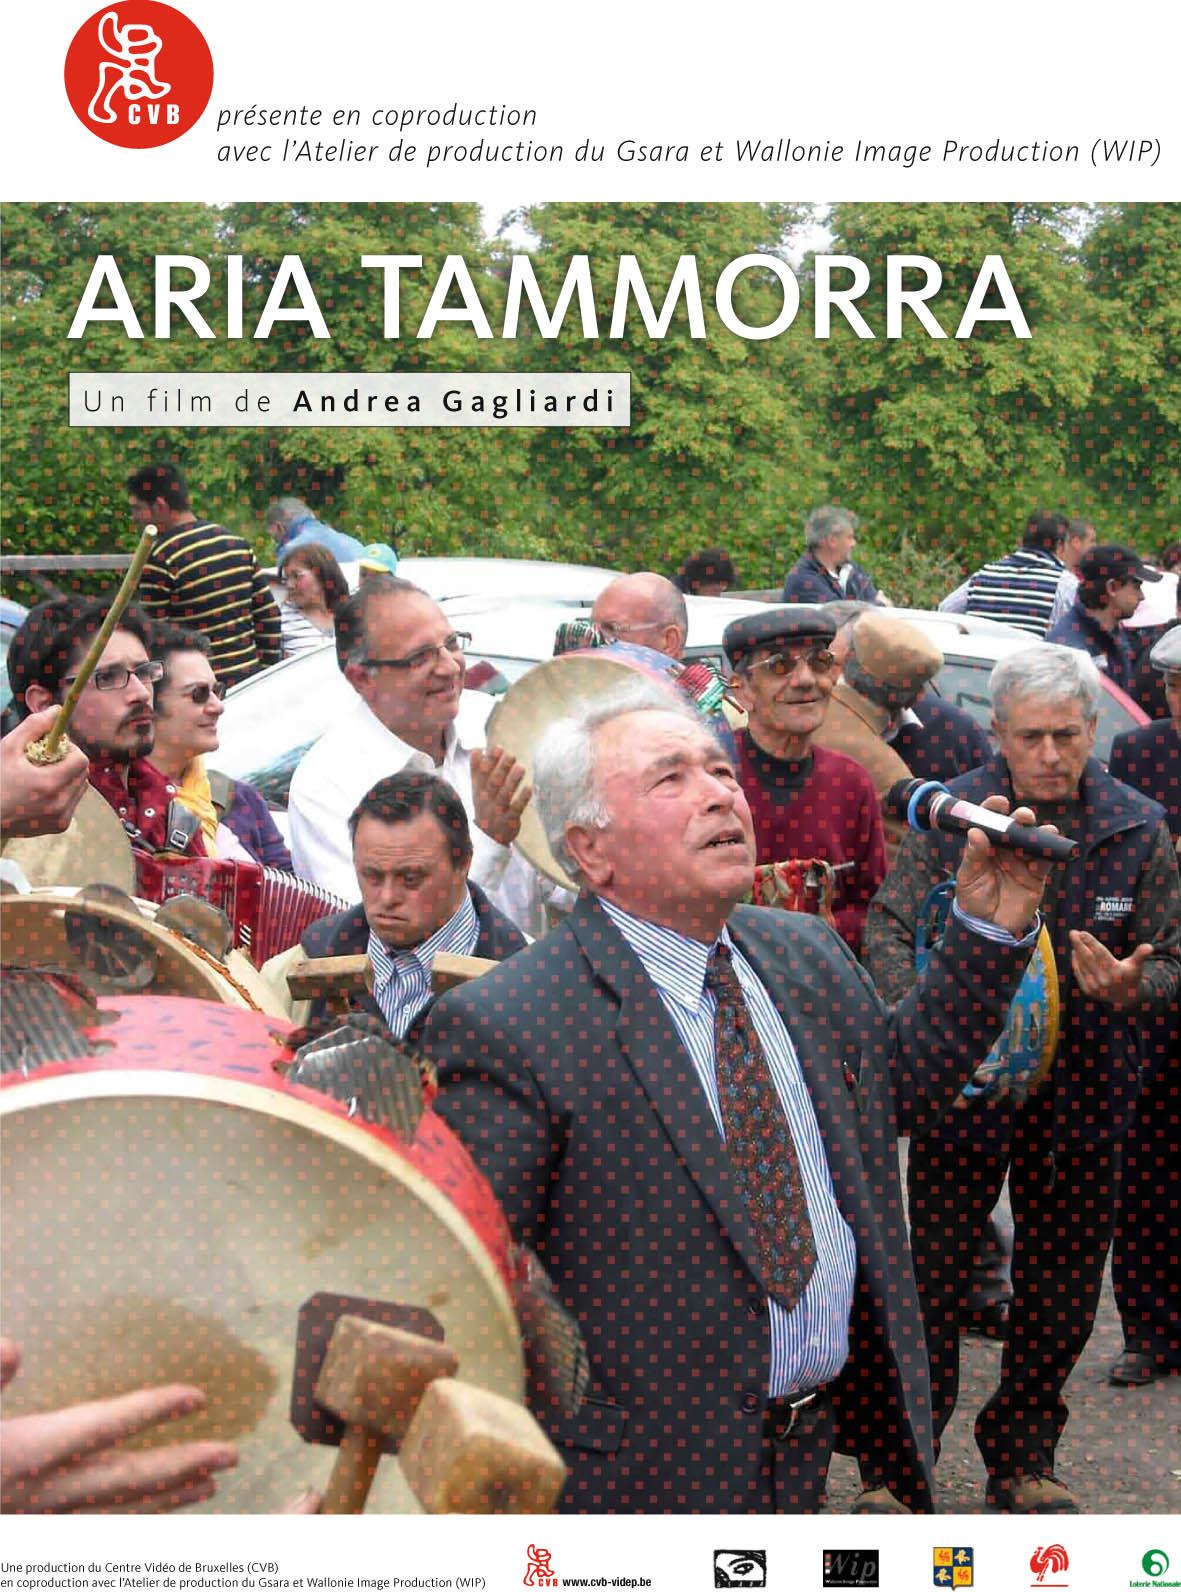 aria_tammorra_.jpg